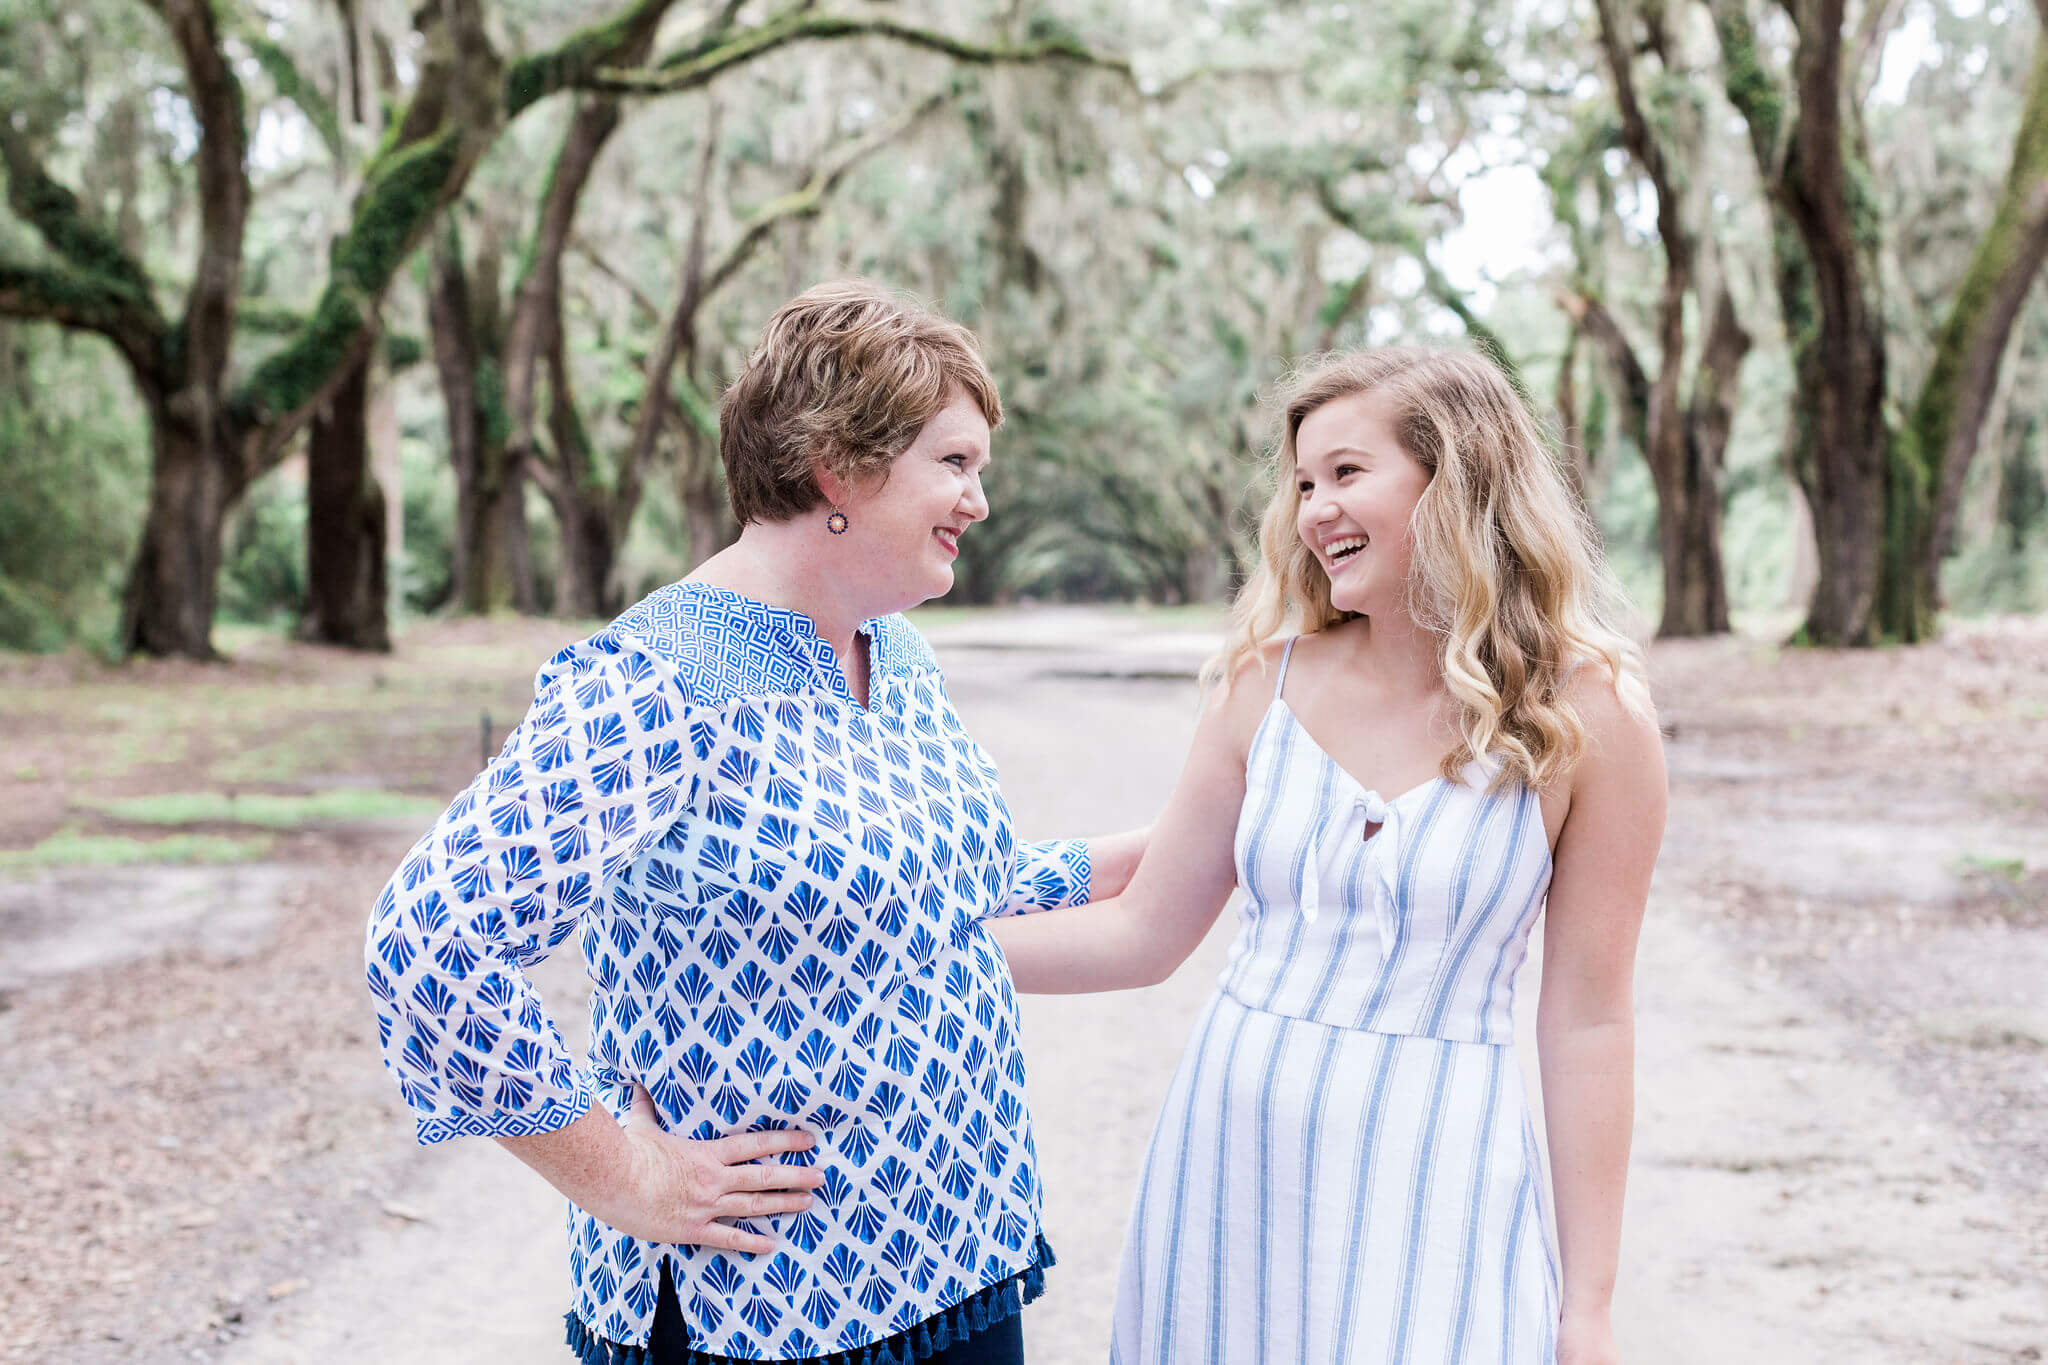 Apt-b-photography-savannah-engagement-photographer-savannah-family-kid-hilton-head-elopement-savannah-wedding-photographer-8.jpg